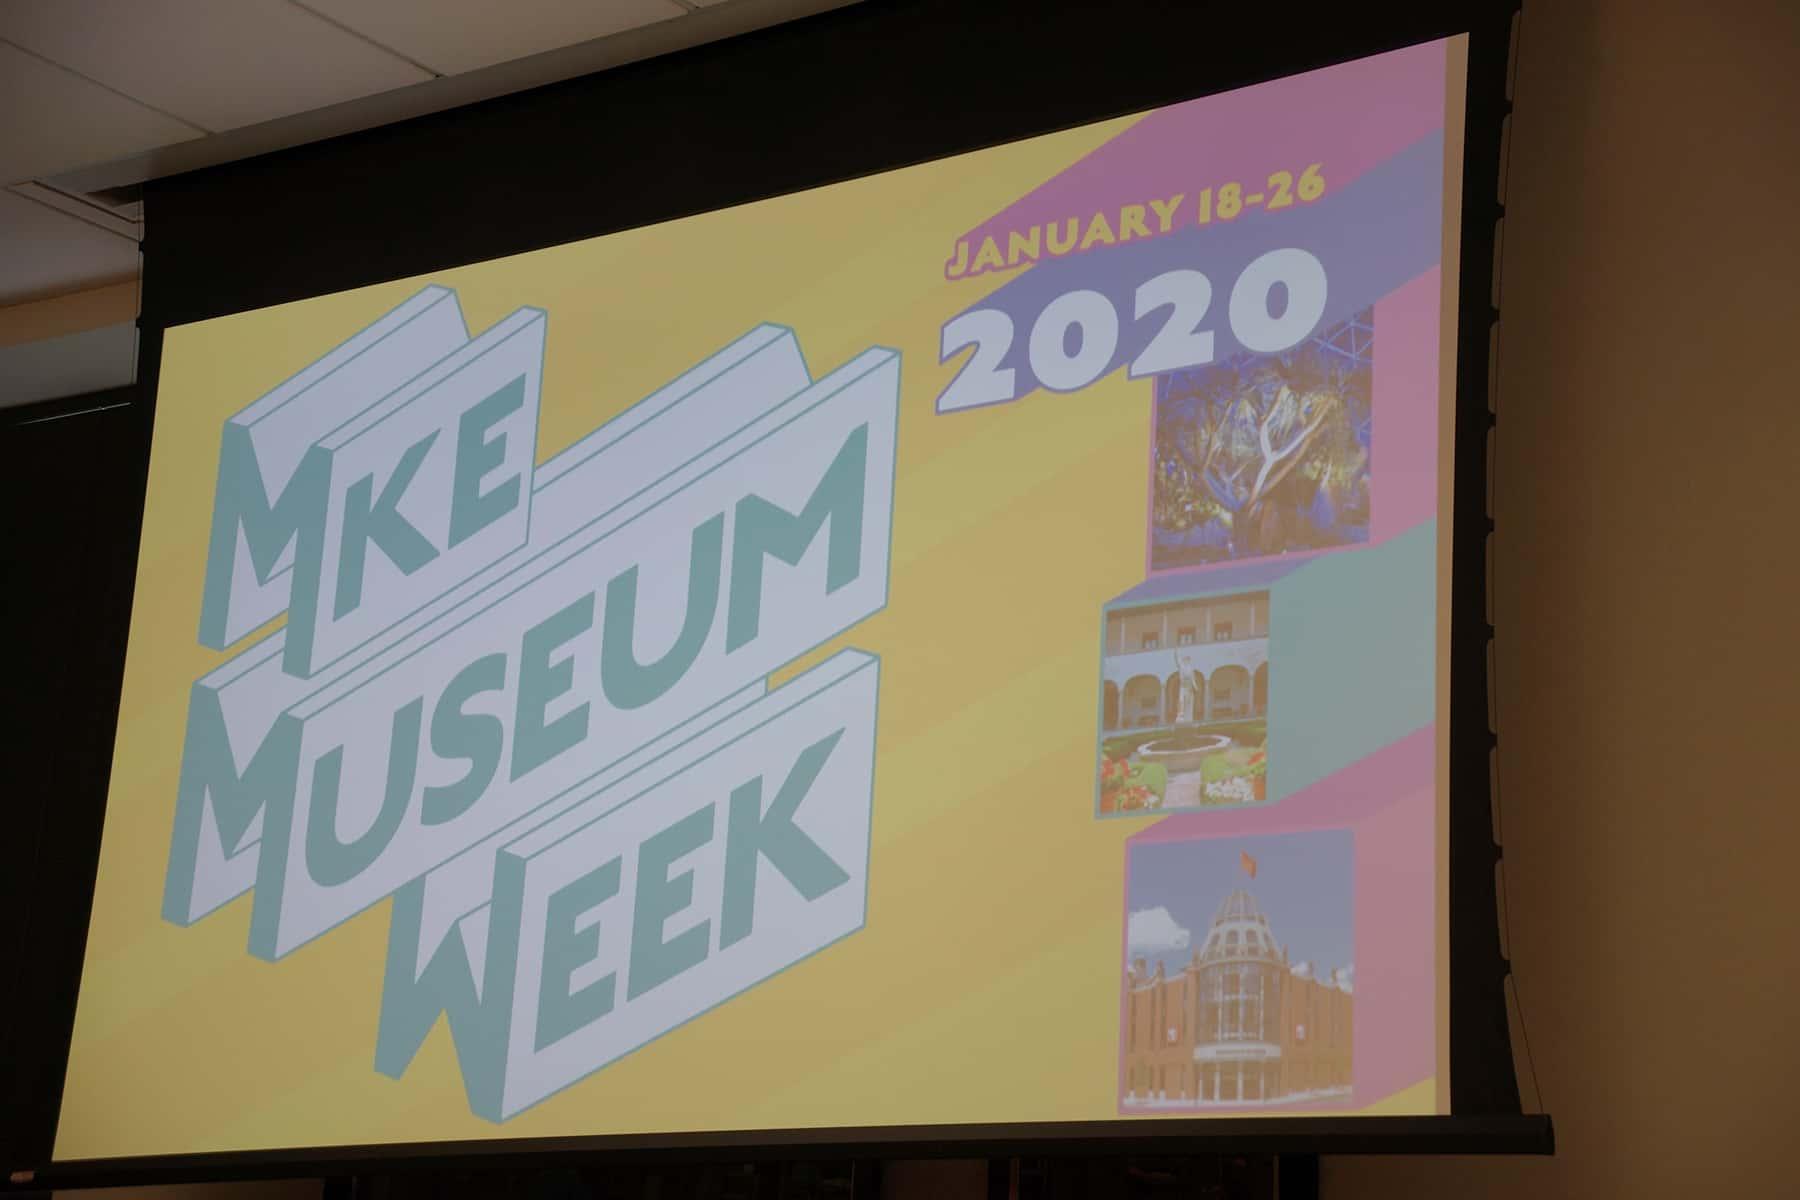 011720_museumweek2020_09